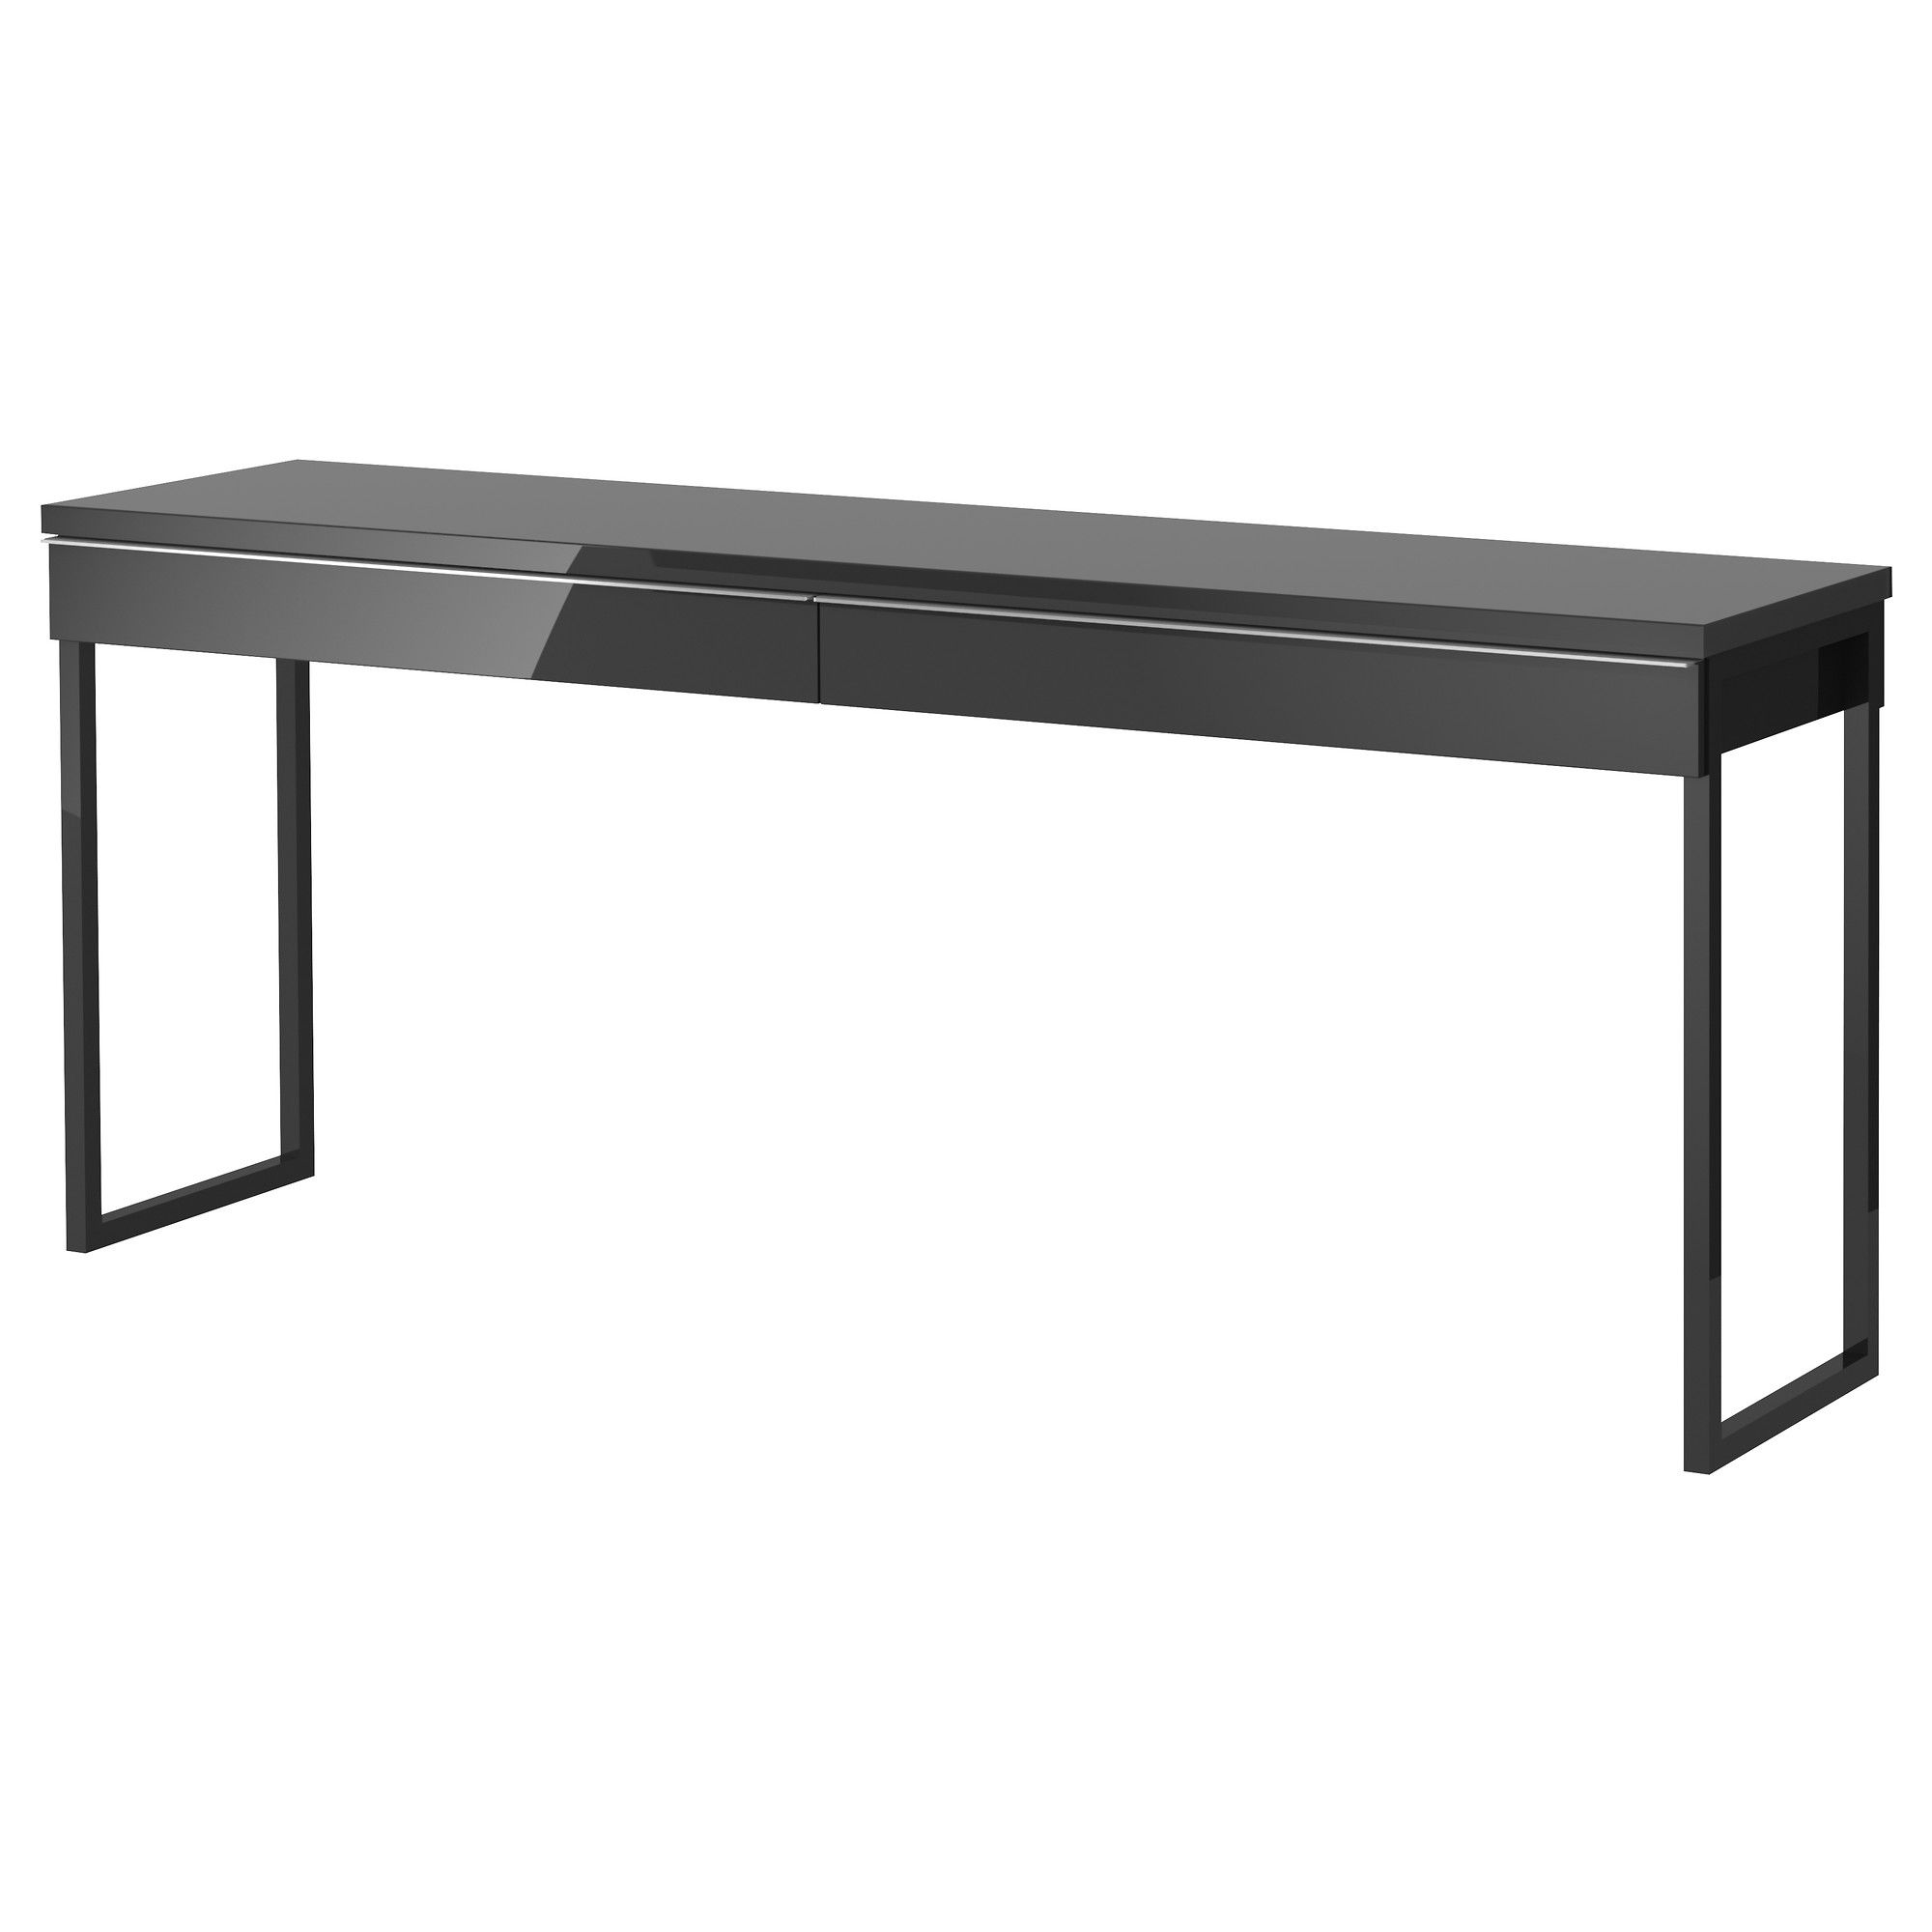 Us Furniture And Home Furnishings Grey Desk Ikea Desk Ikea